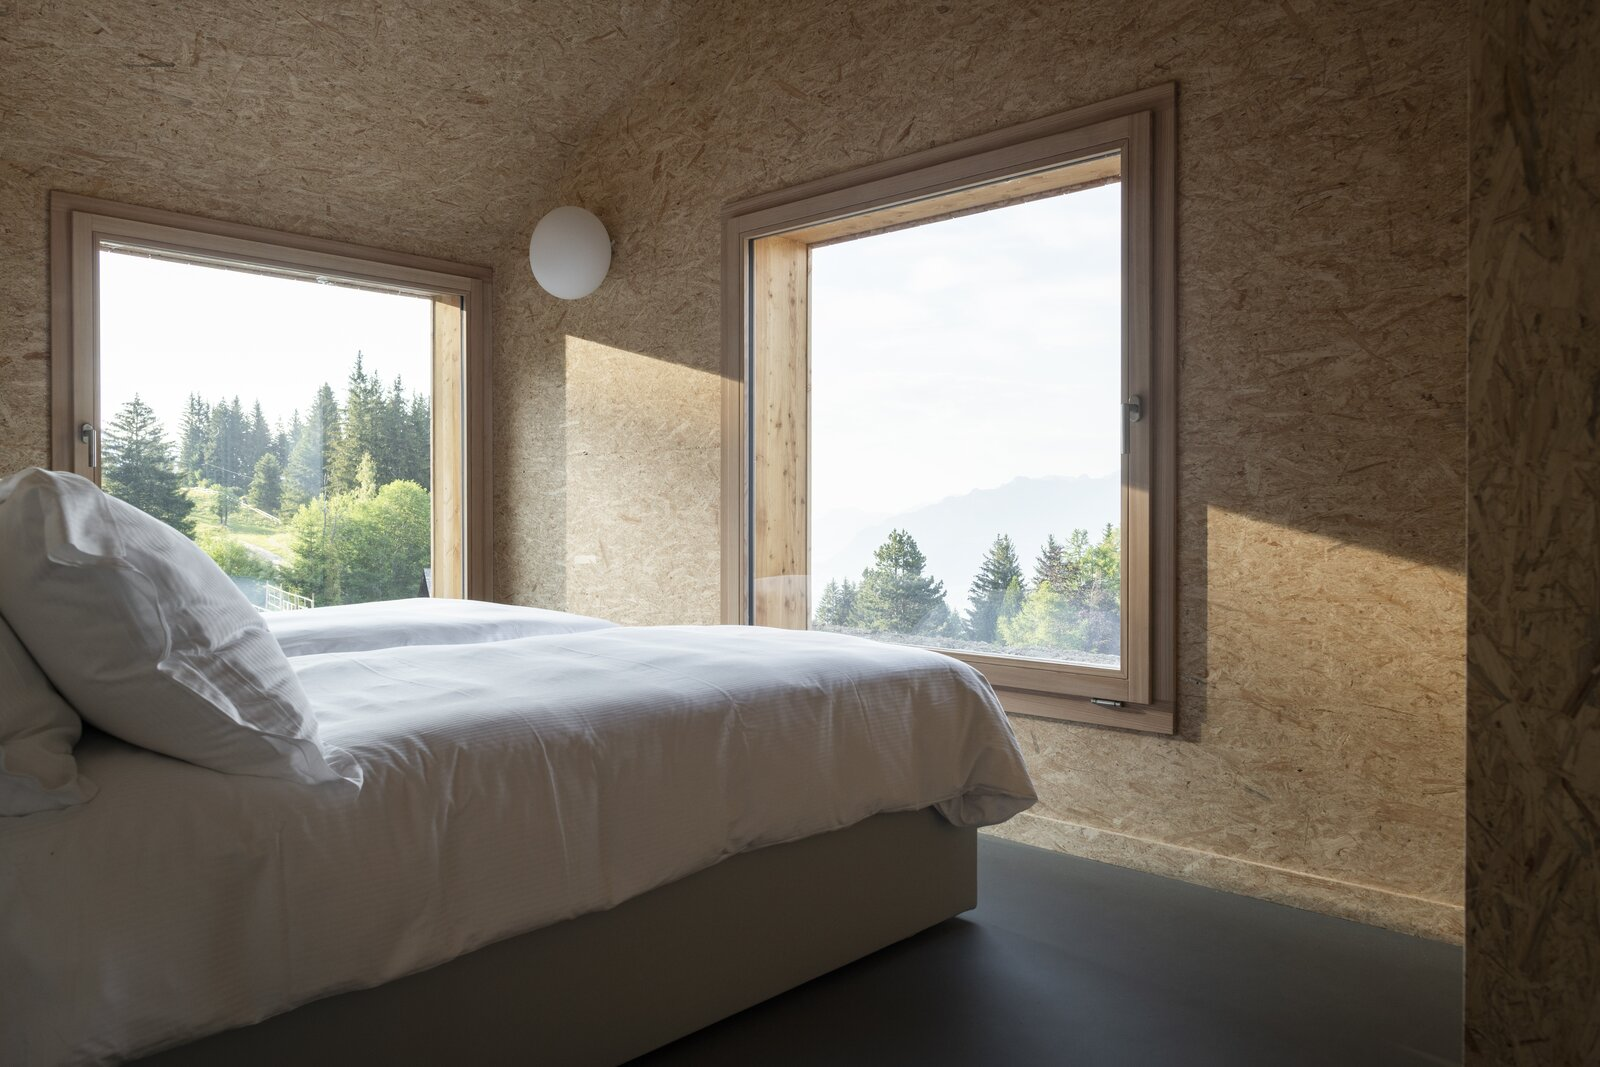 Whitepod Eco-Chalet bedroom